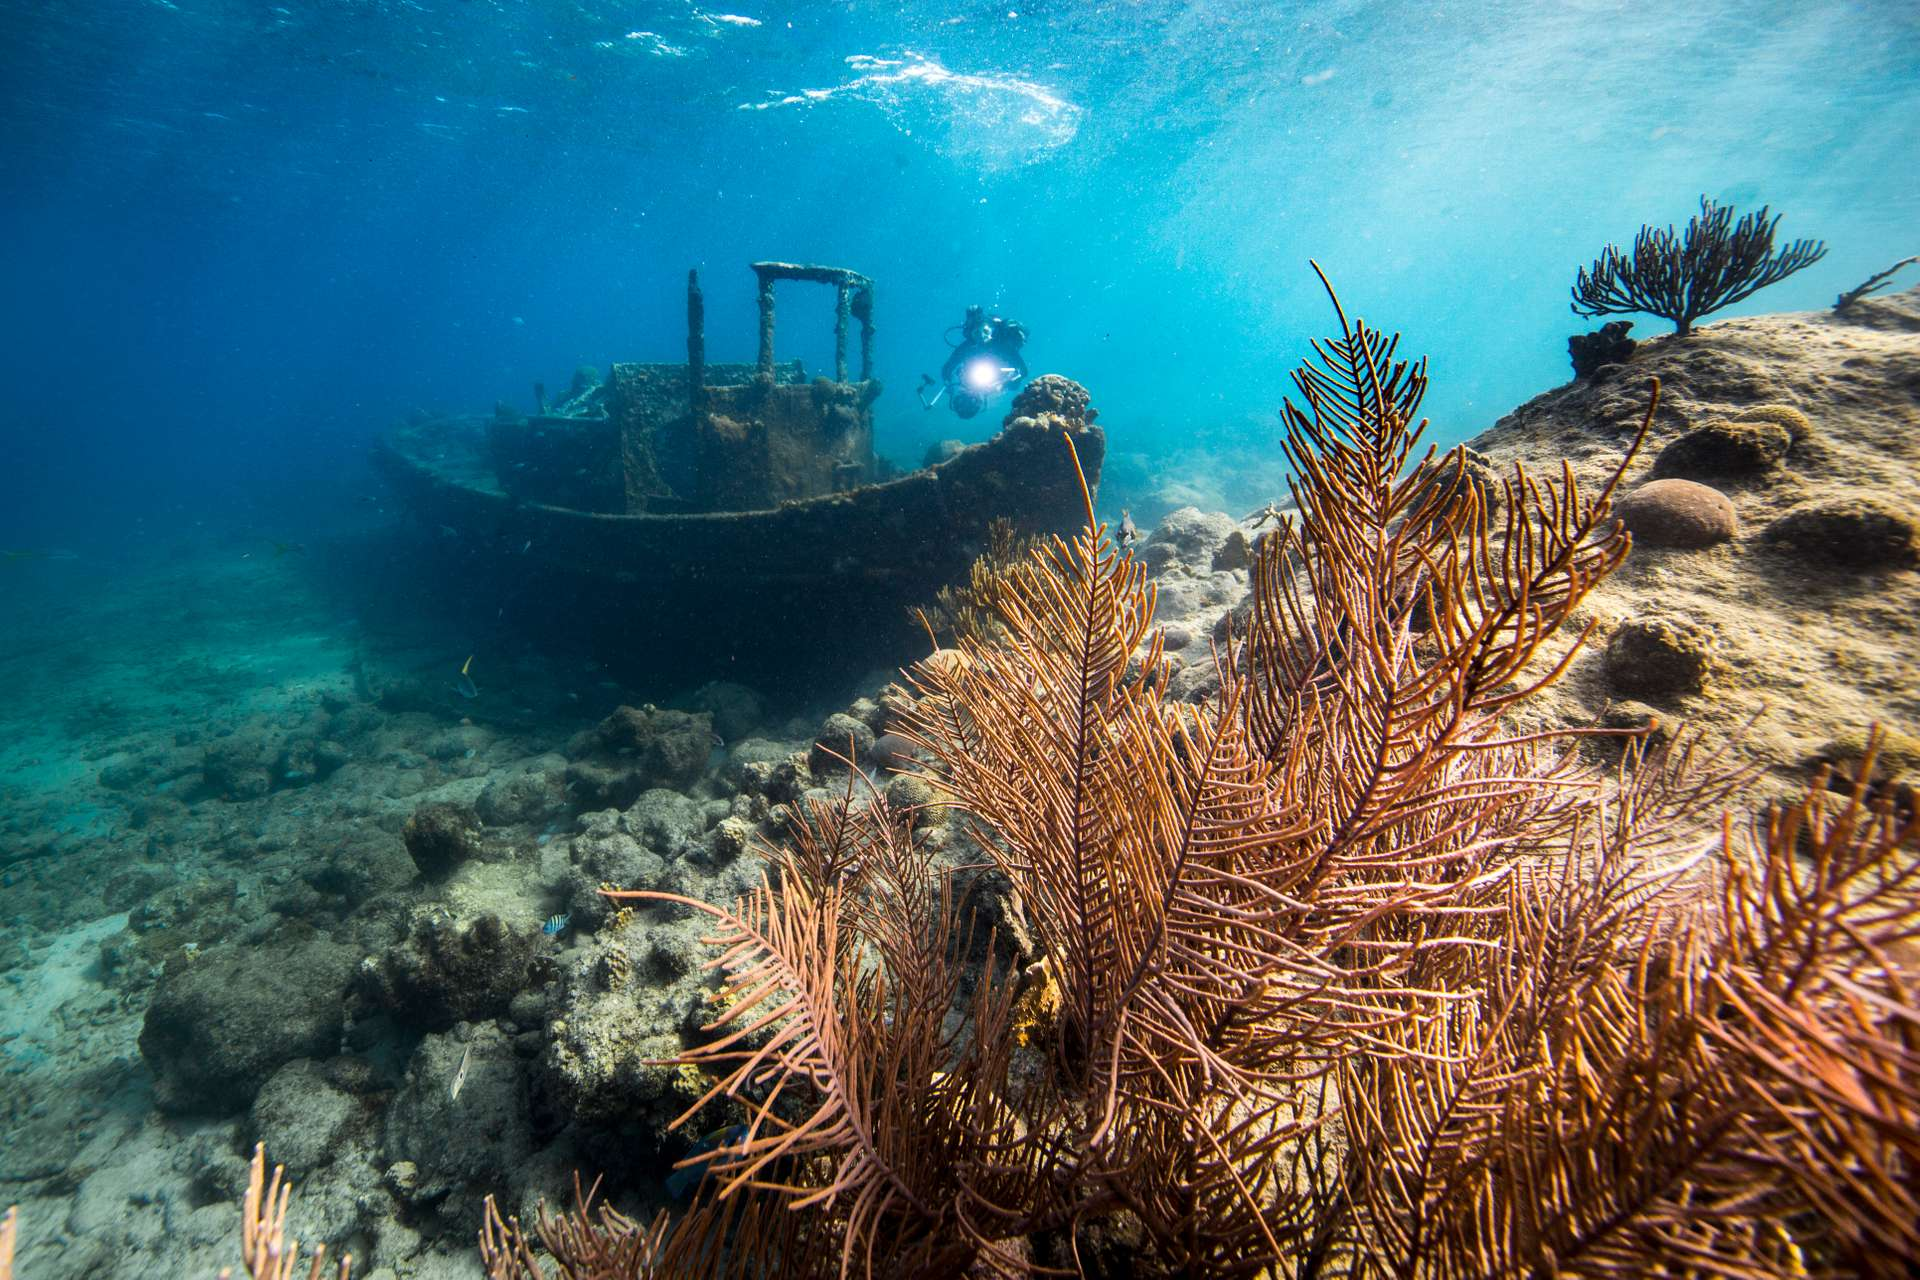 Duiken Curacao, sleepboot